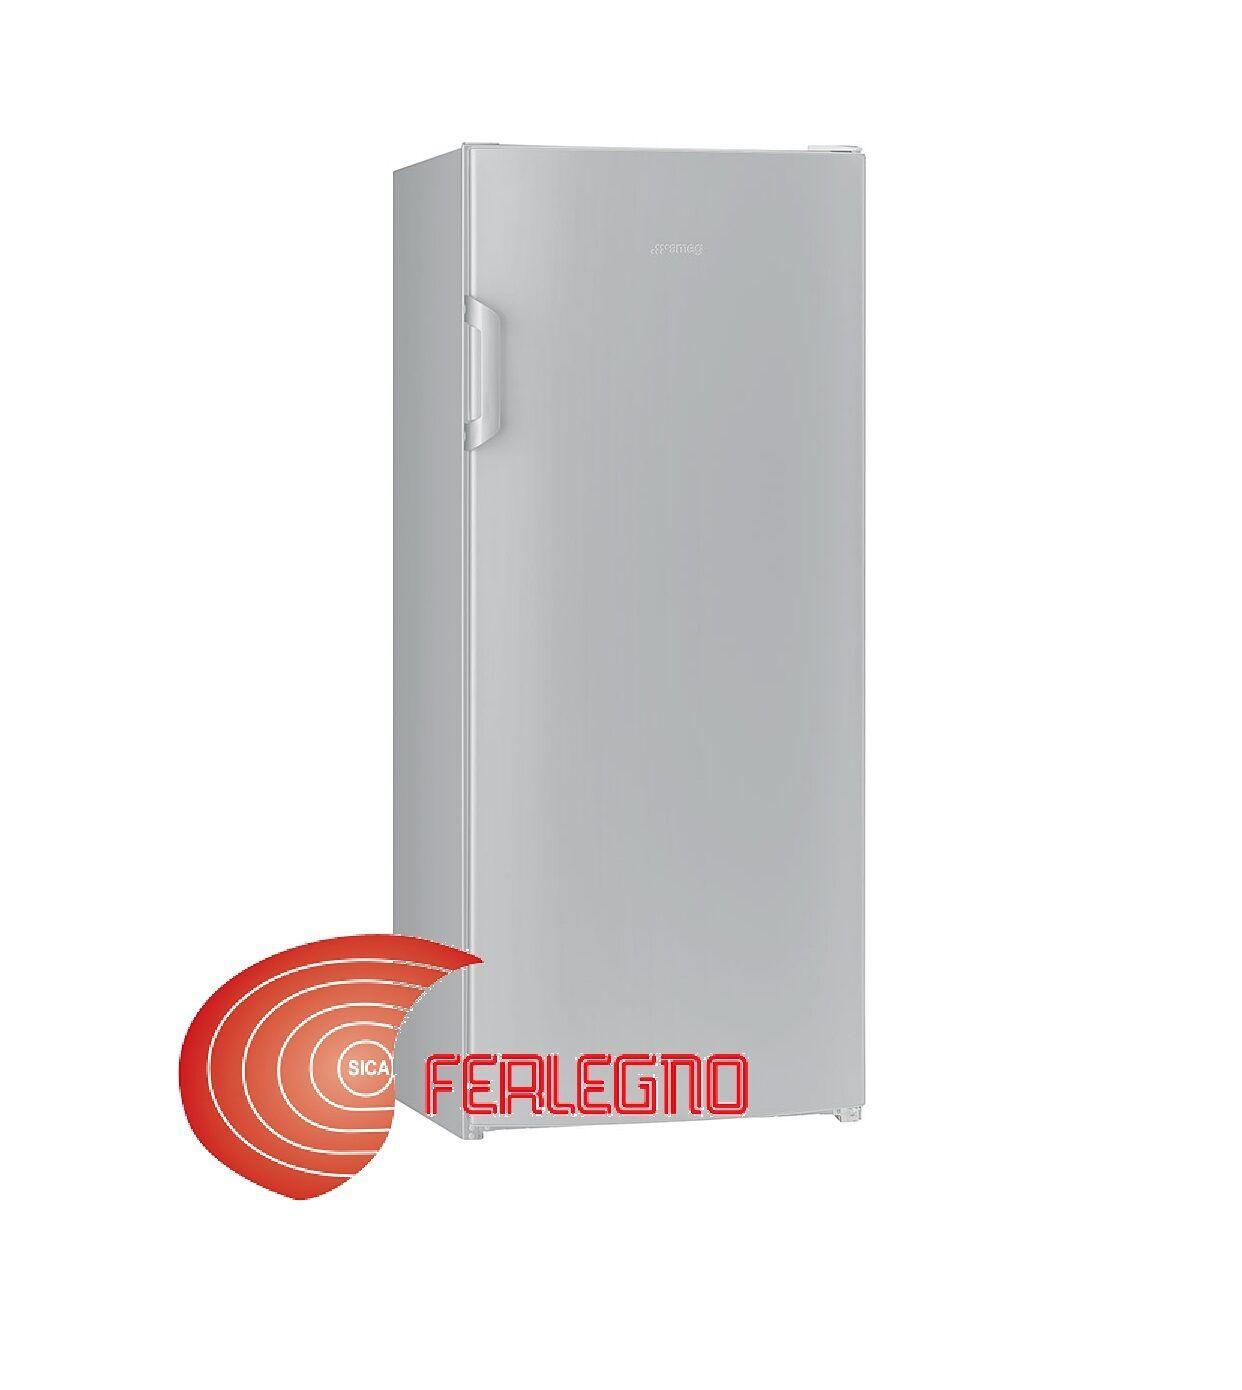 Frigo Smeg Anni 50 Piccolo frigorifero solo frigo monoporta 60cm cerniera dx silver a+